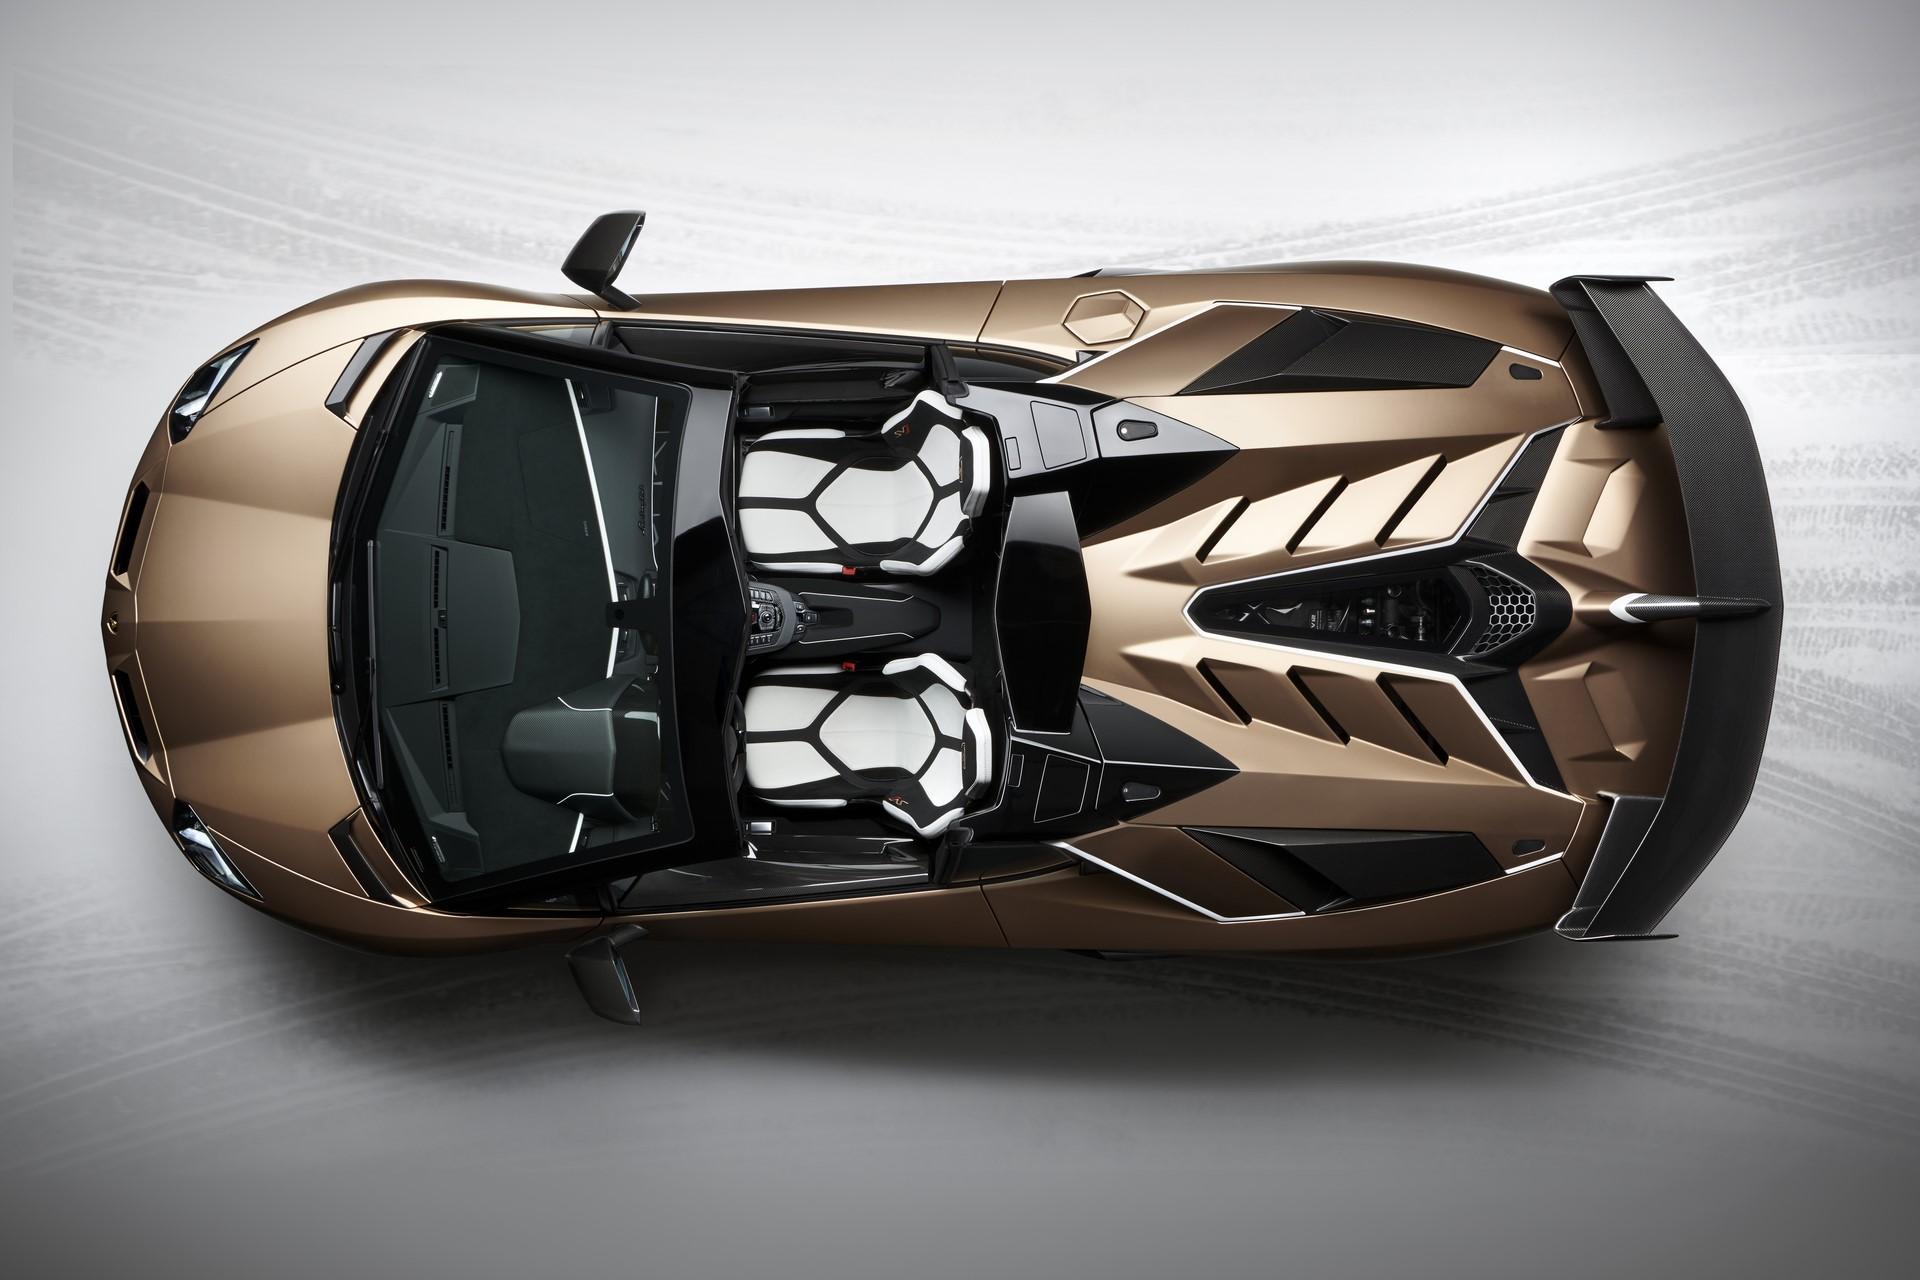 Lamborghini Aventador SVJ Roadster (20)